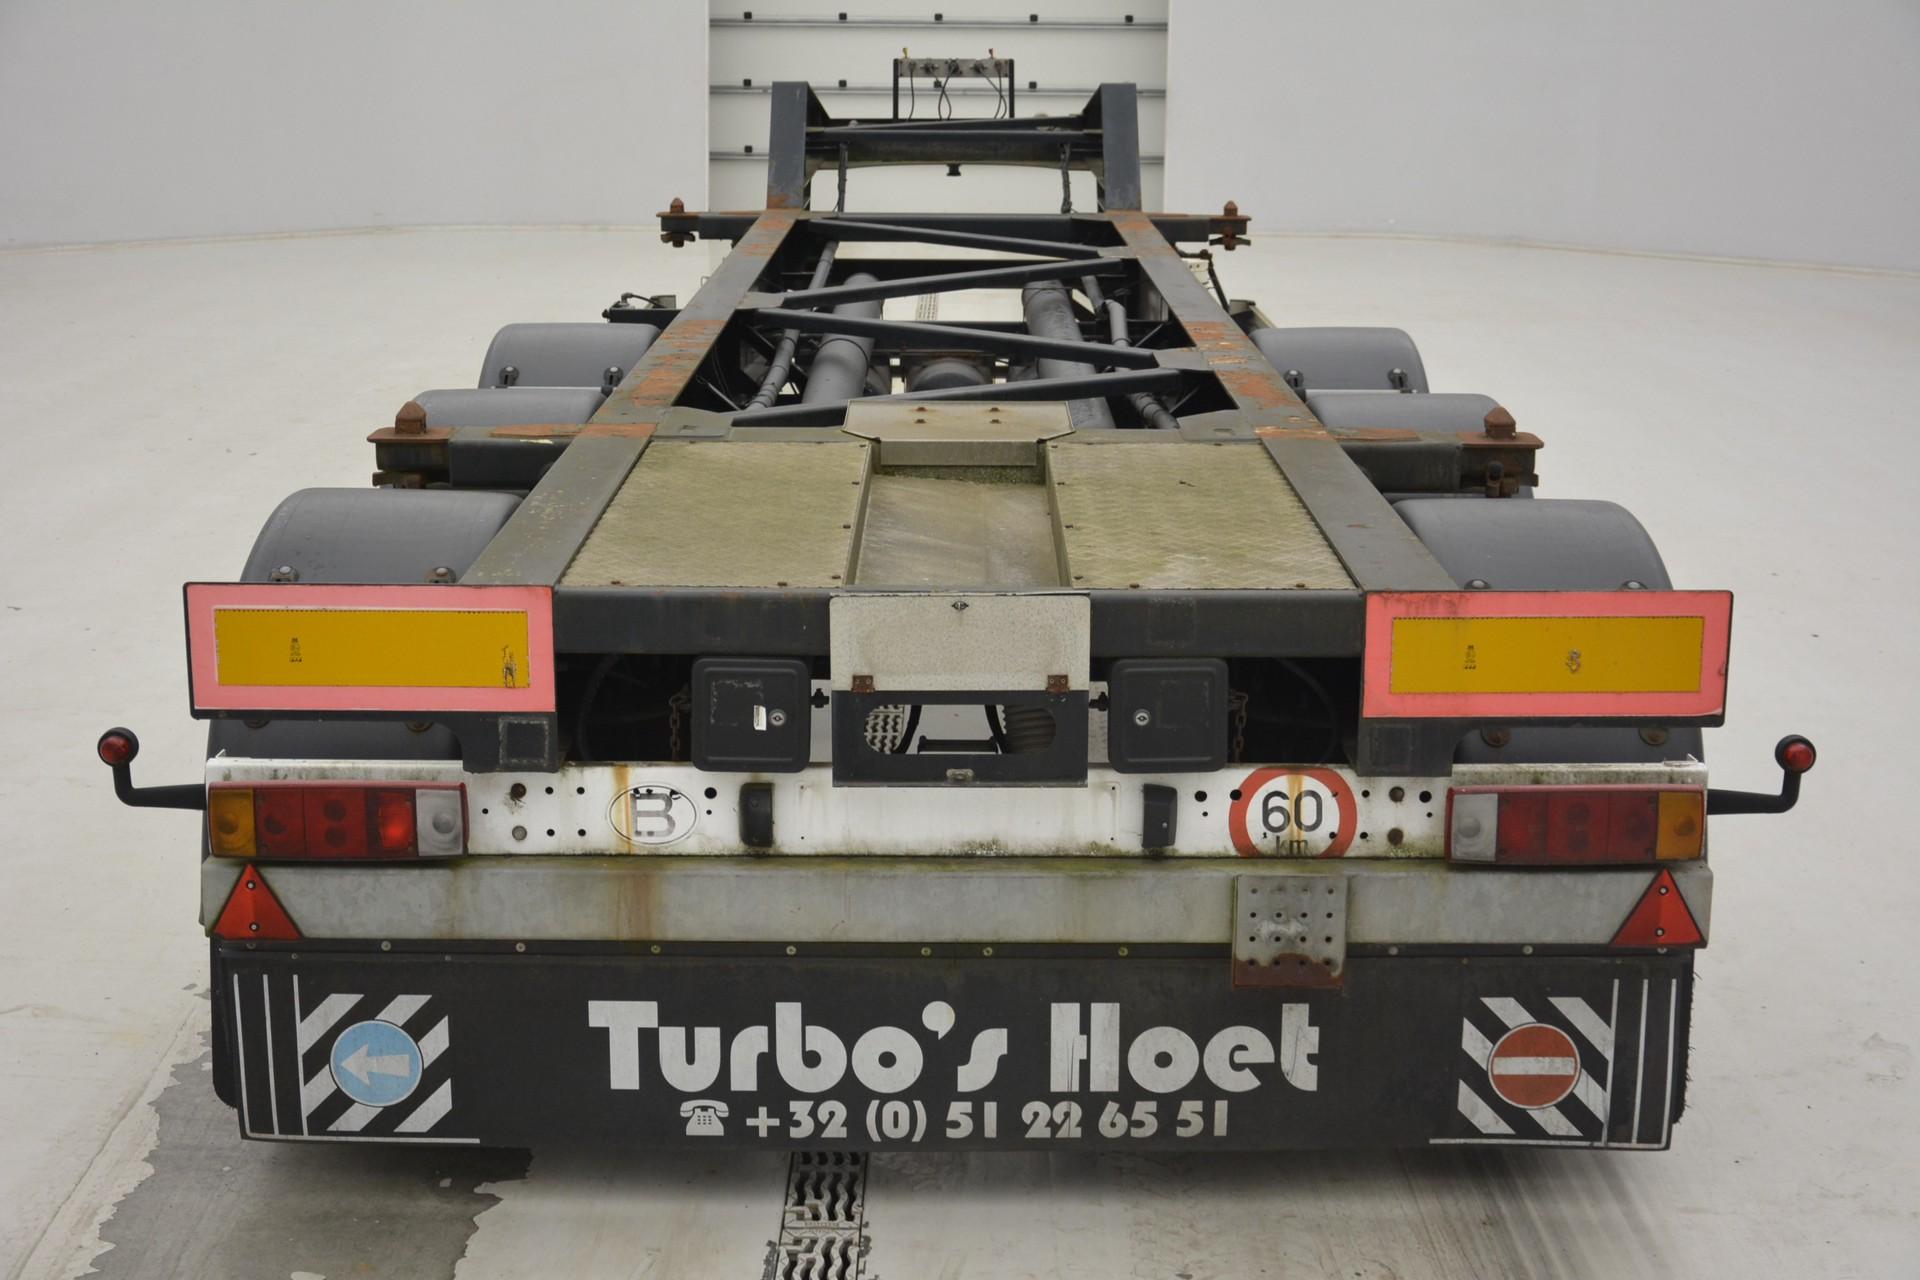 TURBO'S HOET 20 ft skelet